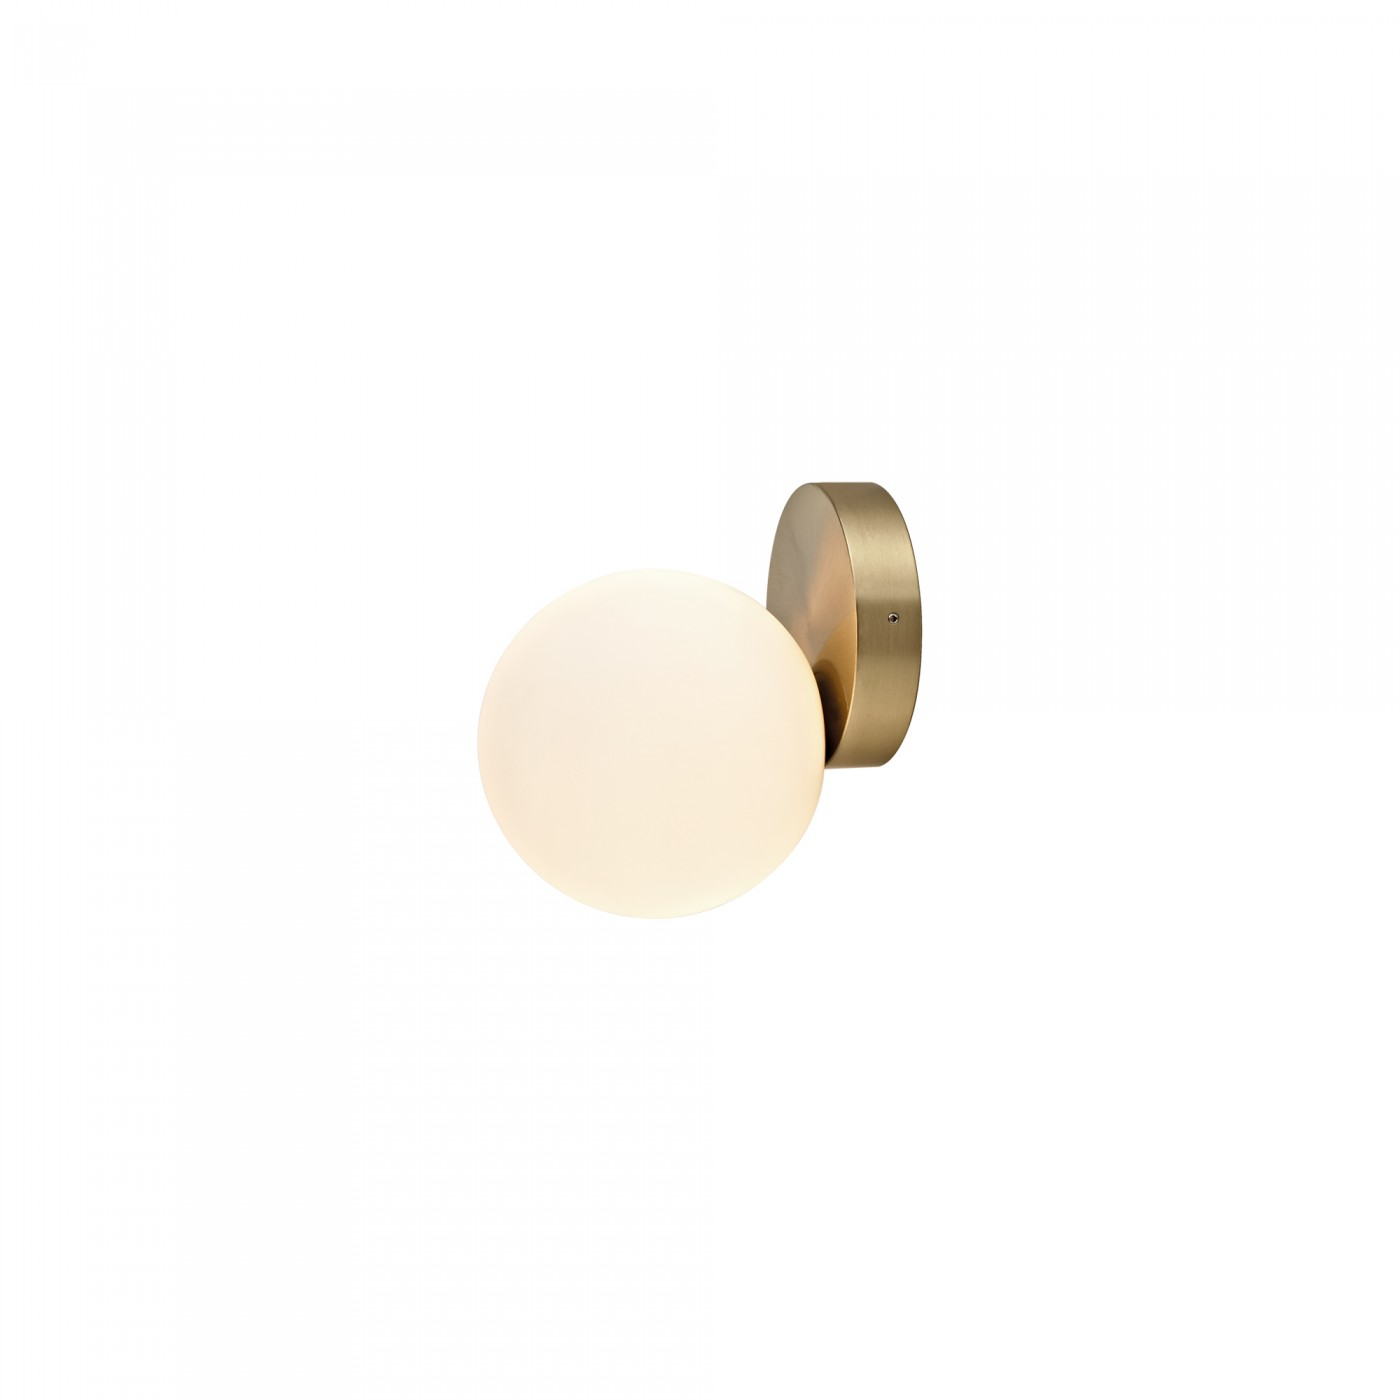 ICE BALL brass 8126 Nowodvorski Lighting